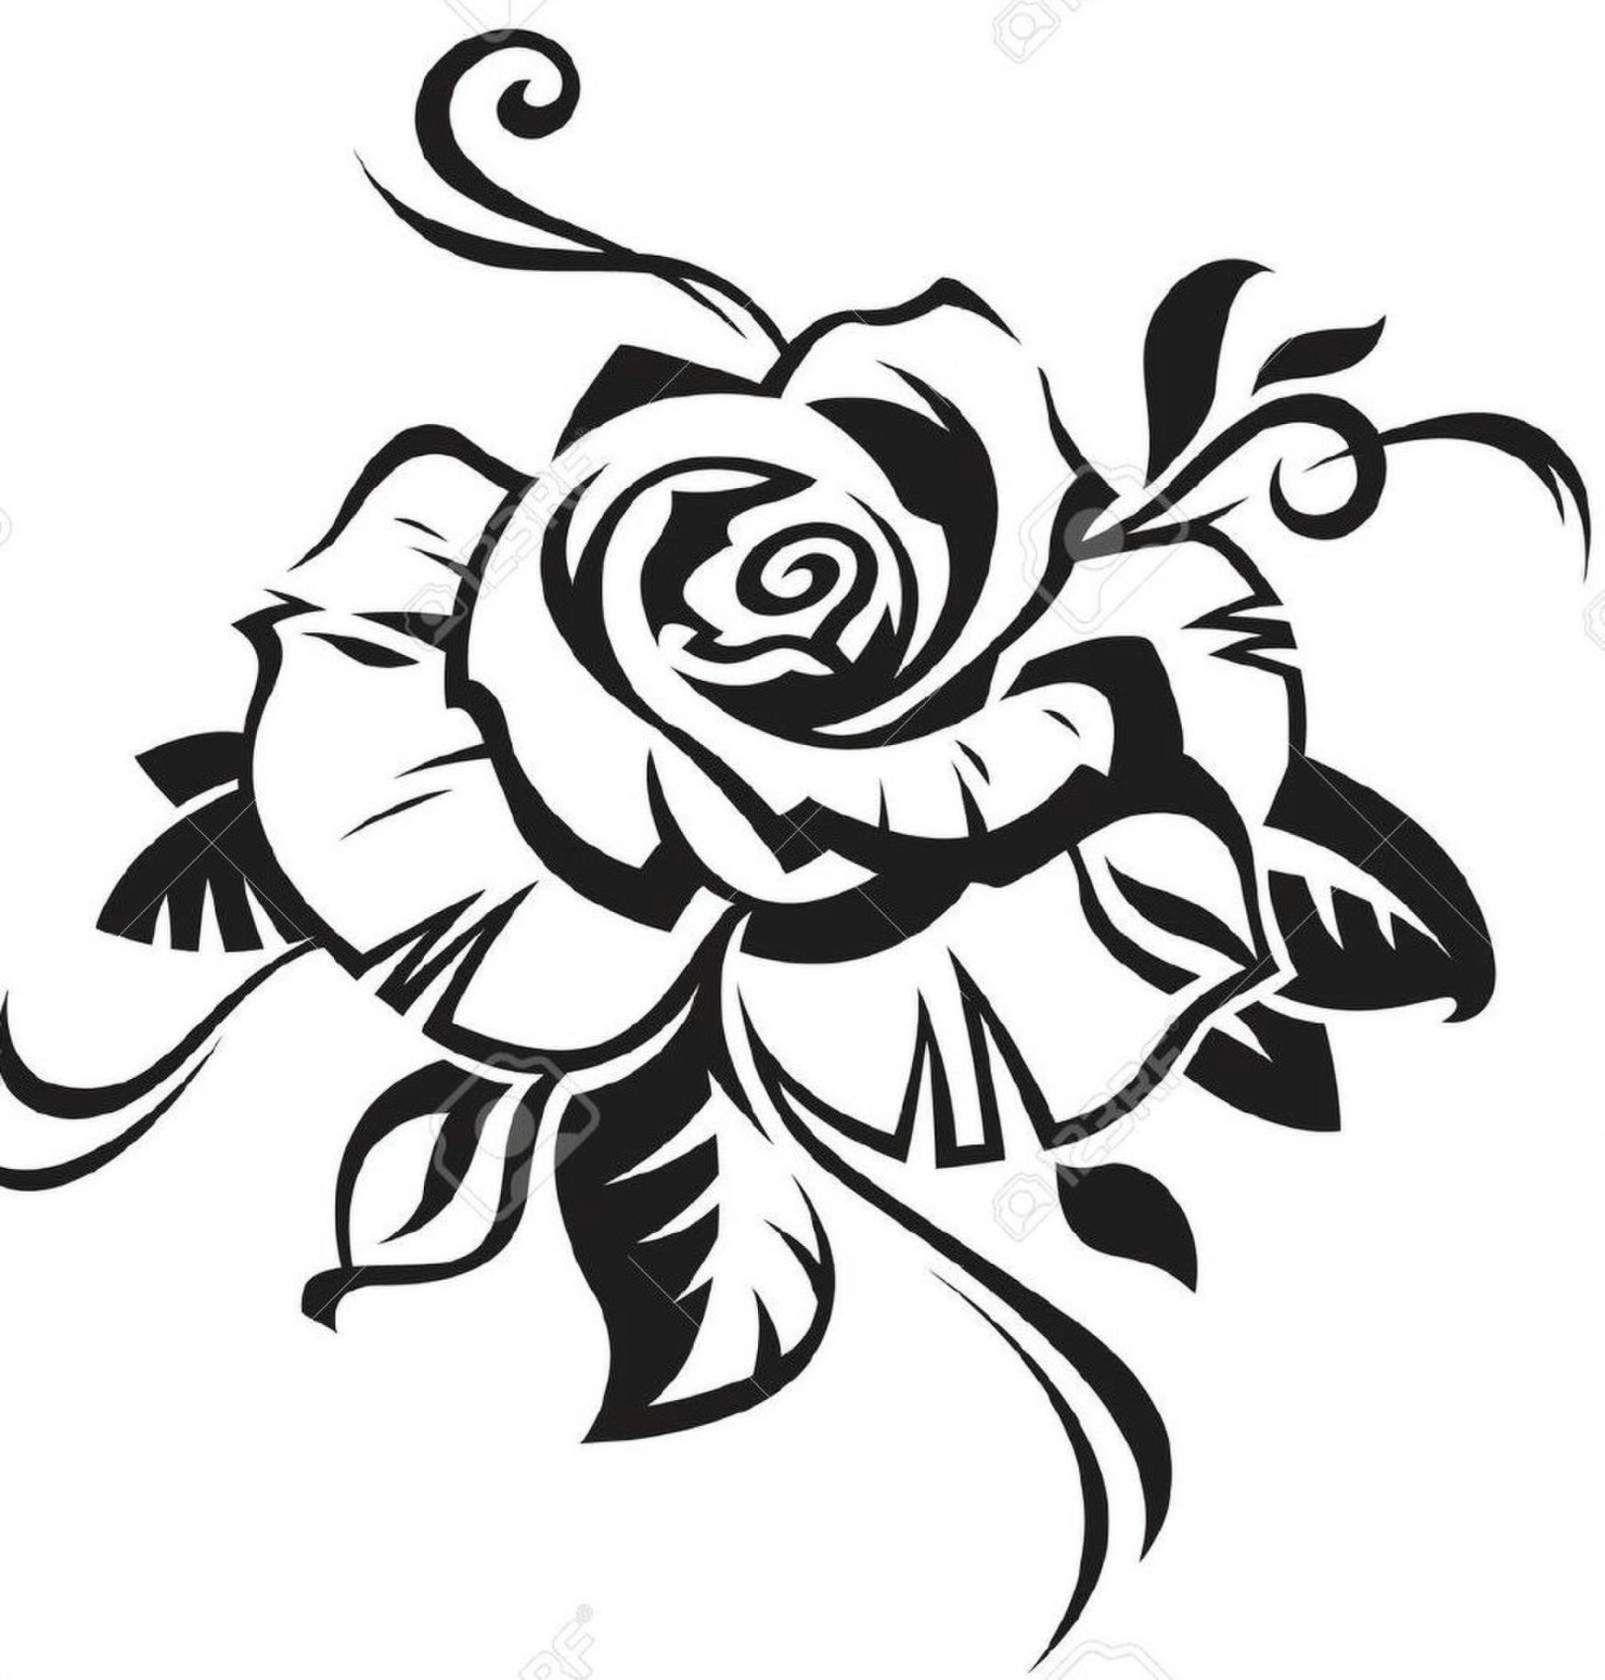 Картинки розы черно белые тату, логотипами самсунг